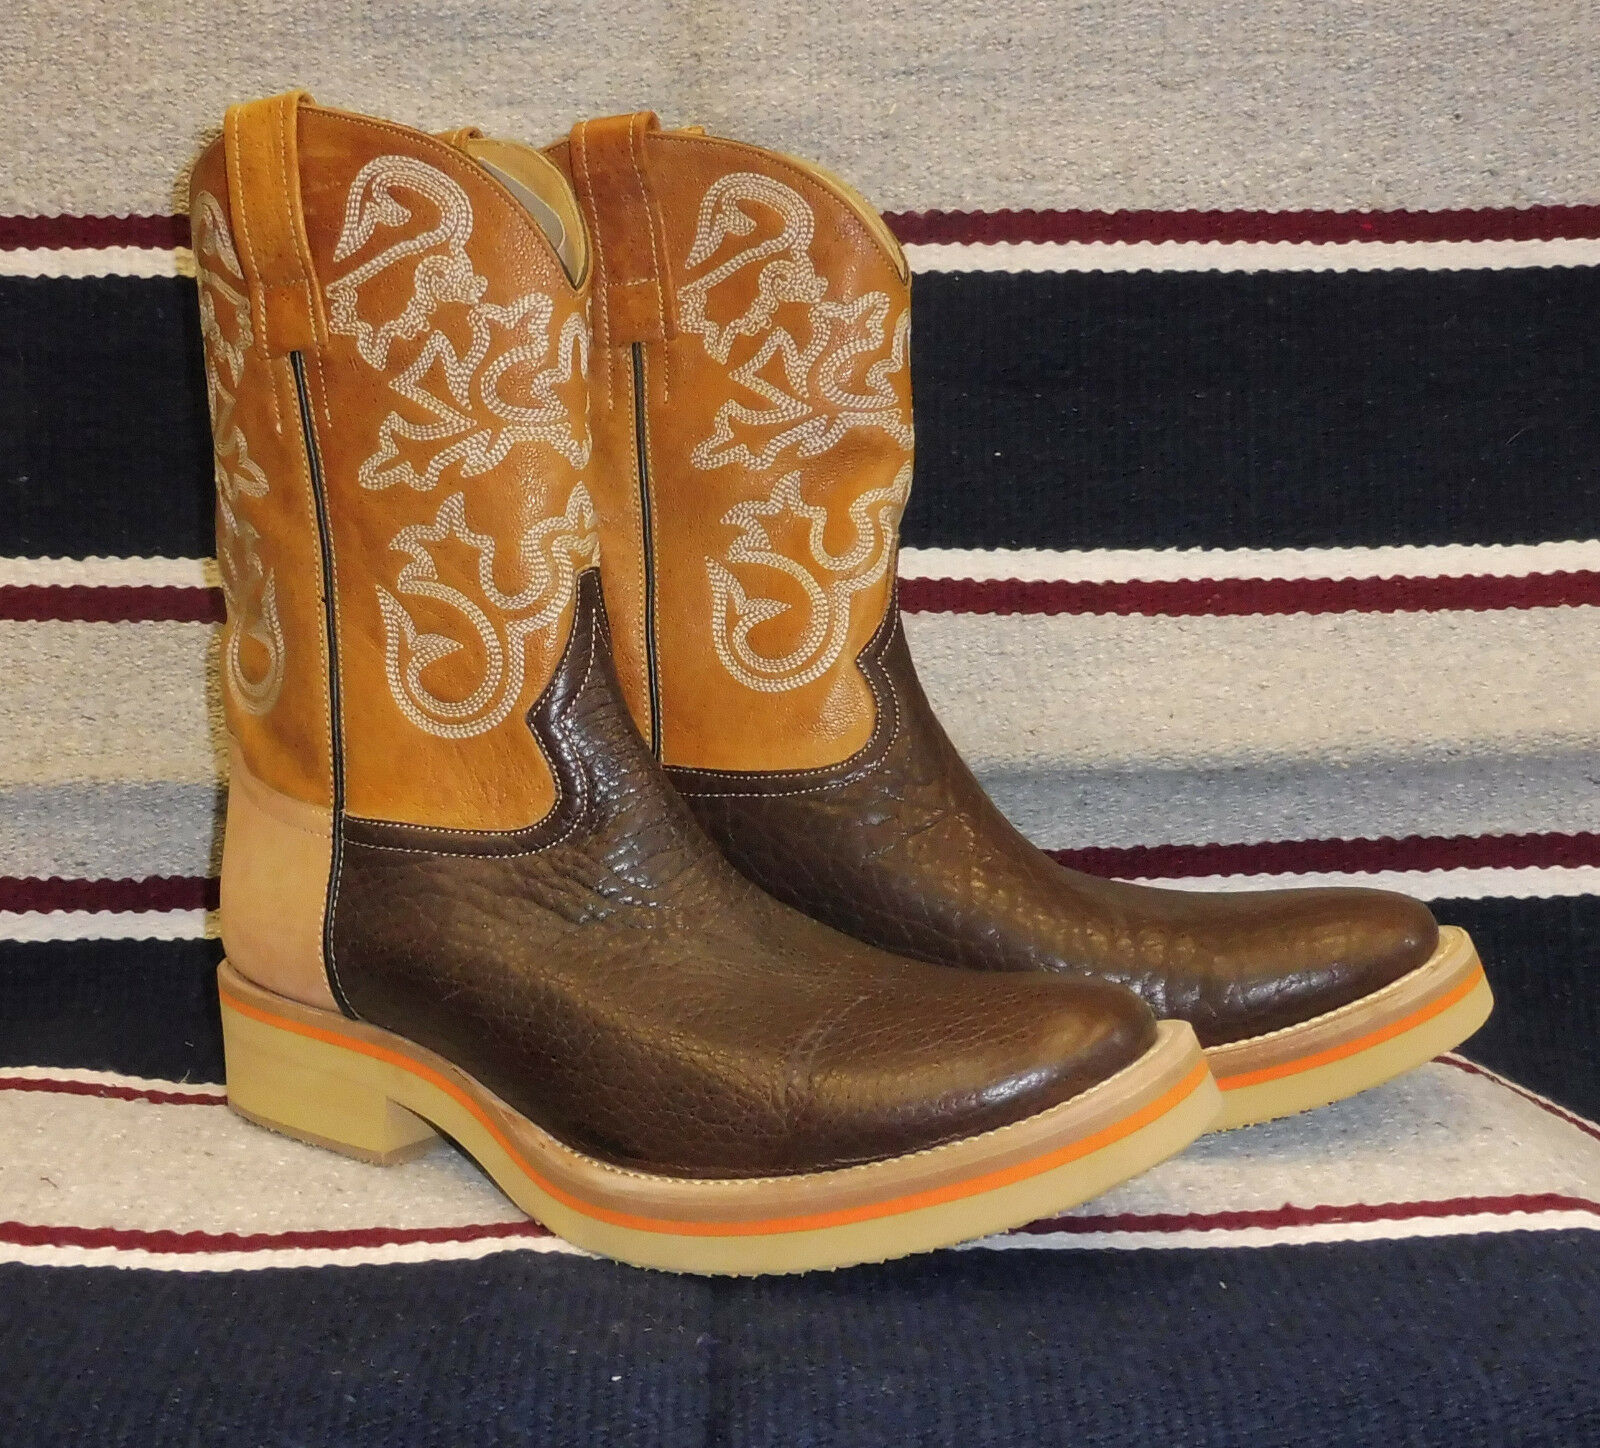 S3055 S3055 S3055 Stivali stivale roper texani country monta western cowboy BARKLEY  44 5d2